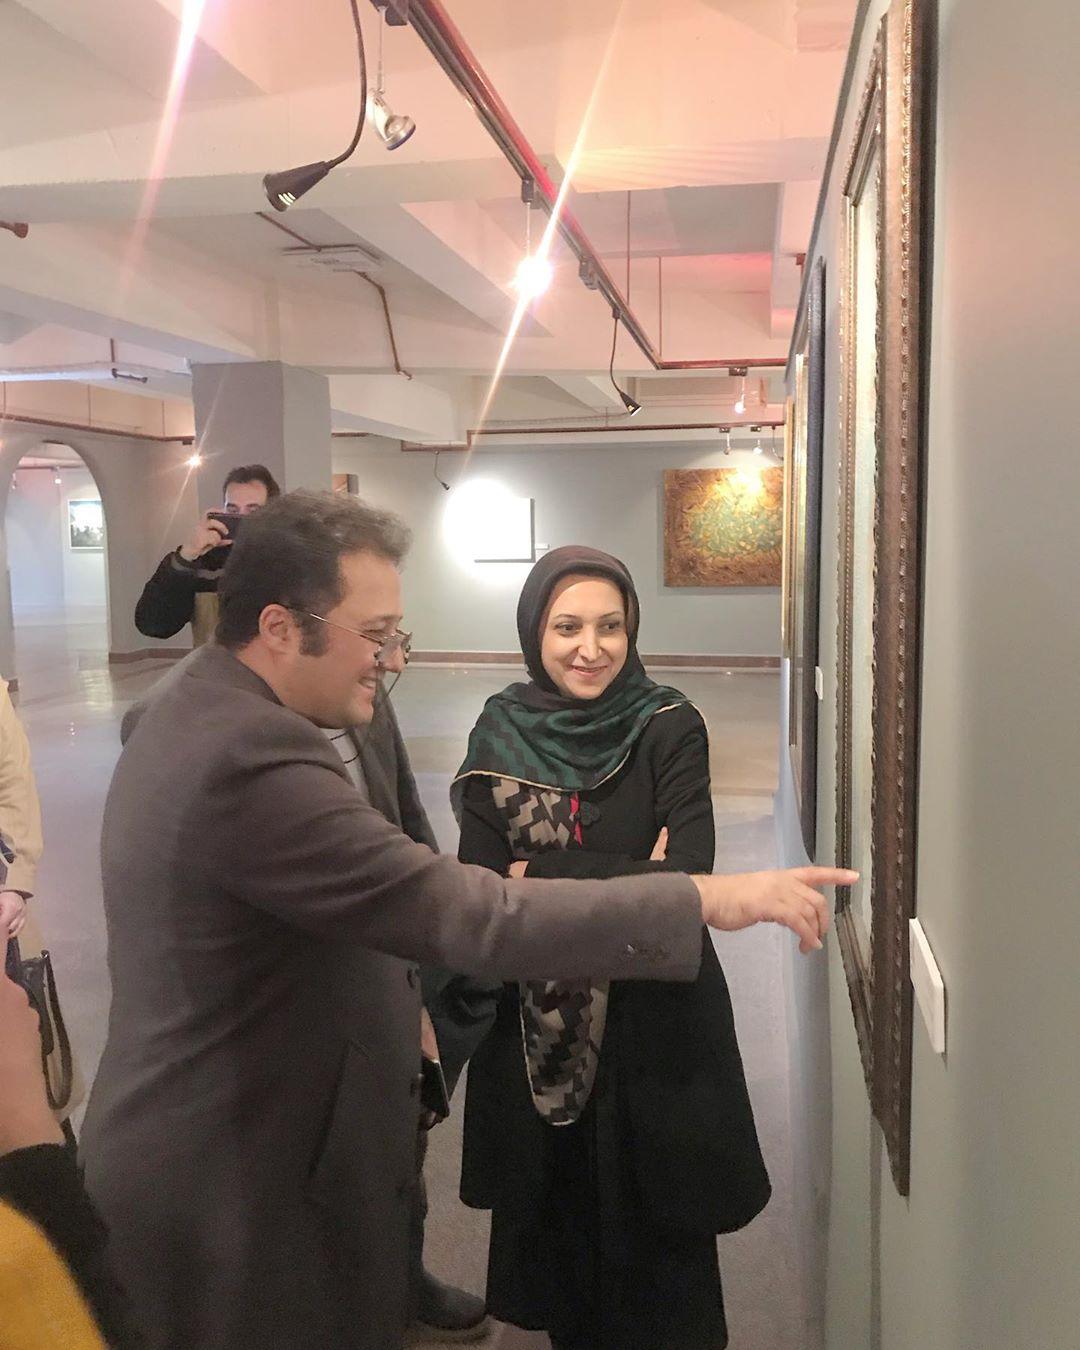 Karya Kaligrafi  جشنواره هنرهای تجسمی فجر، درست یک روز قبل از جنجال بیماری افتتاح شد و در اوج نگ…- Ne Javaher